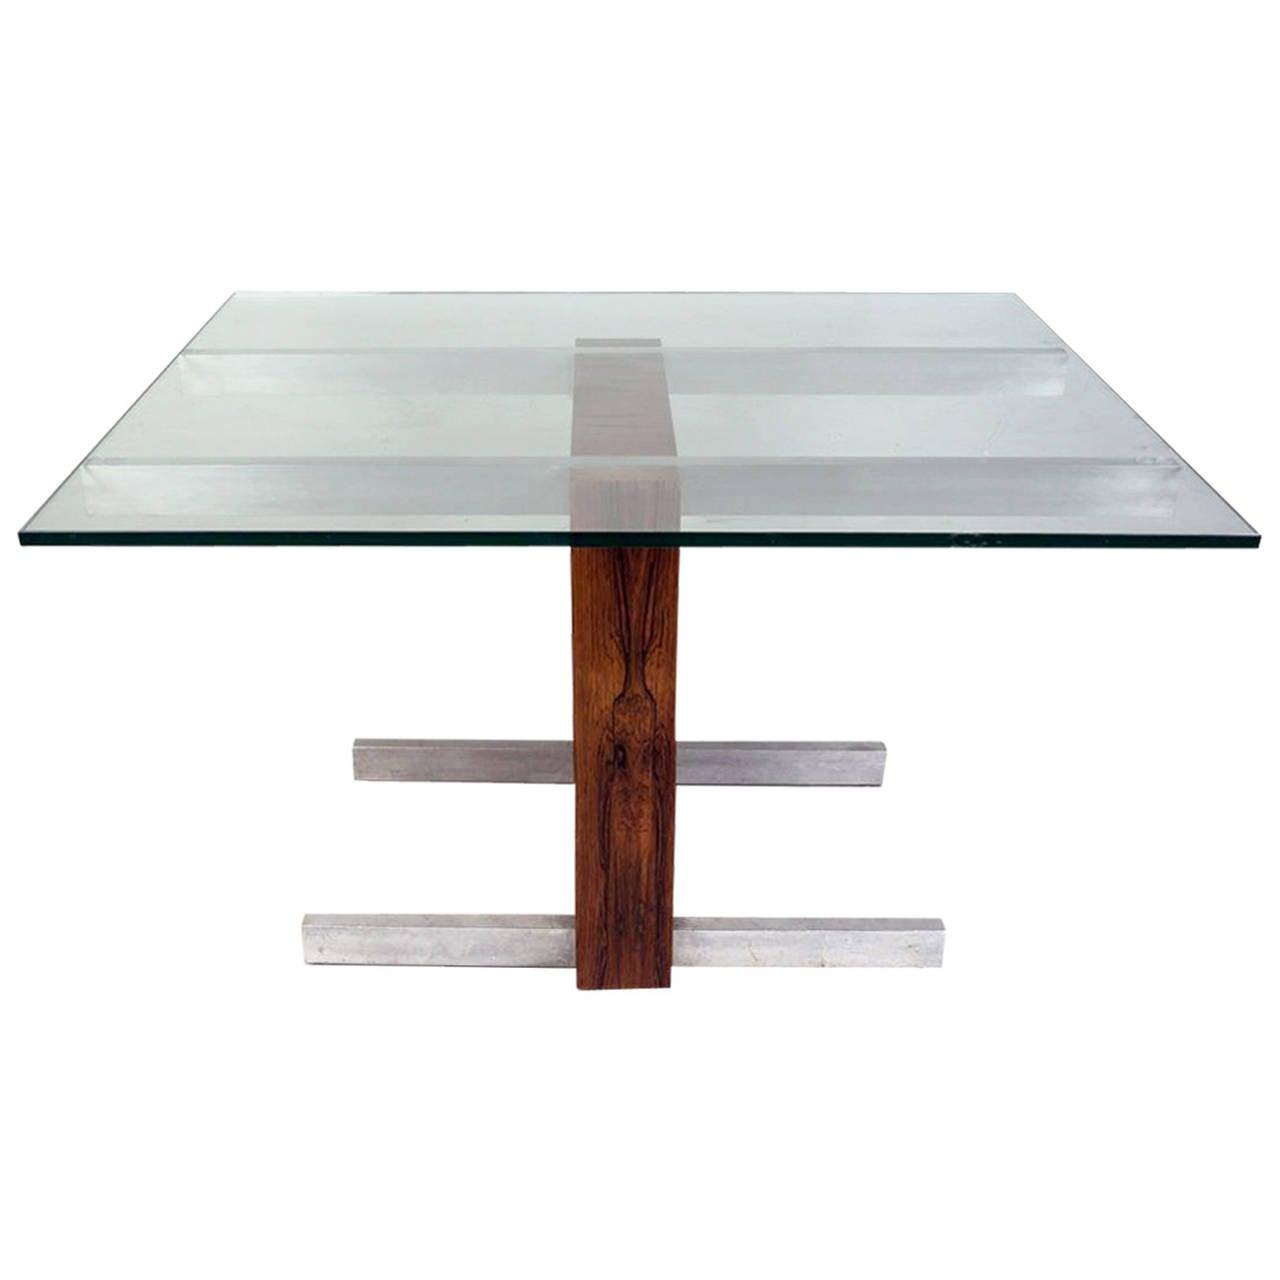 Rosewood and Metal Cubist Table Base by Vladimir Kagan